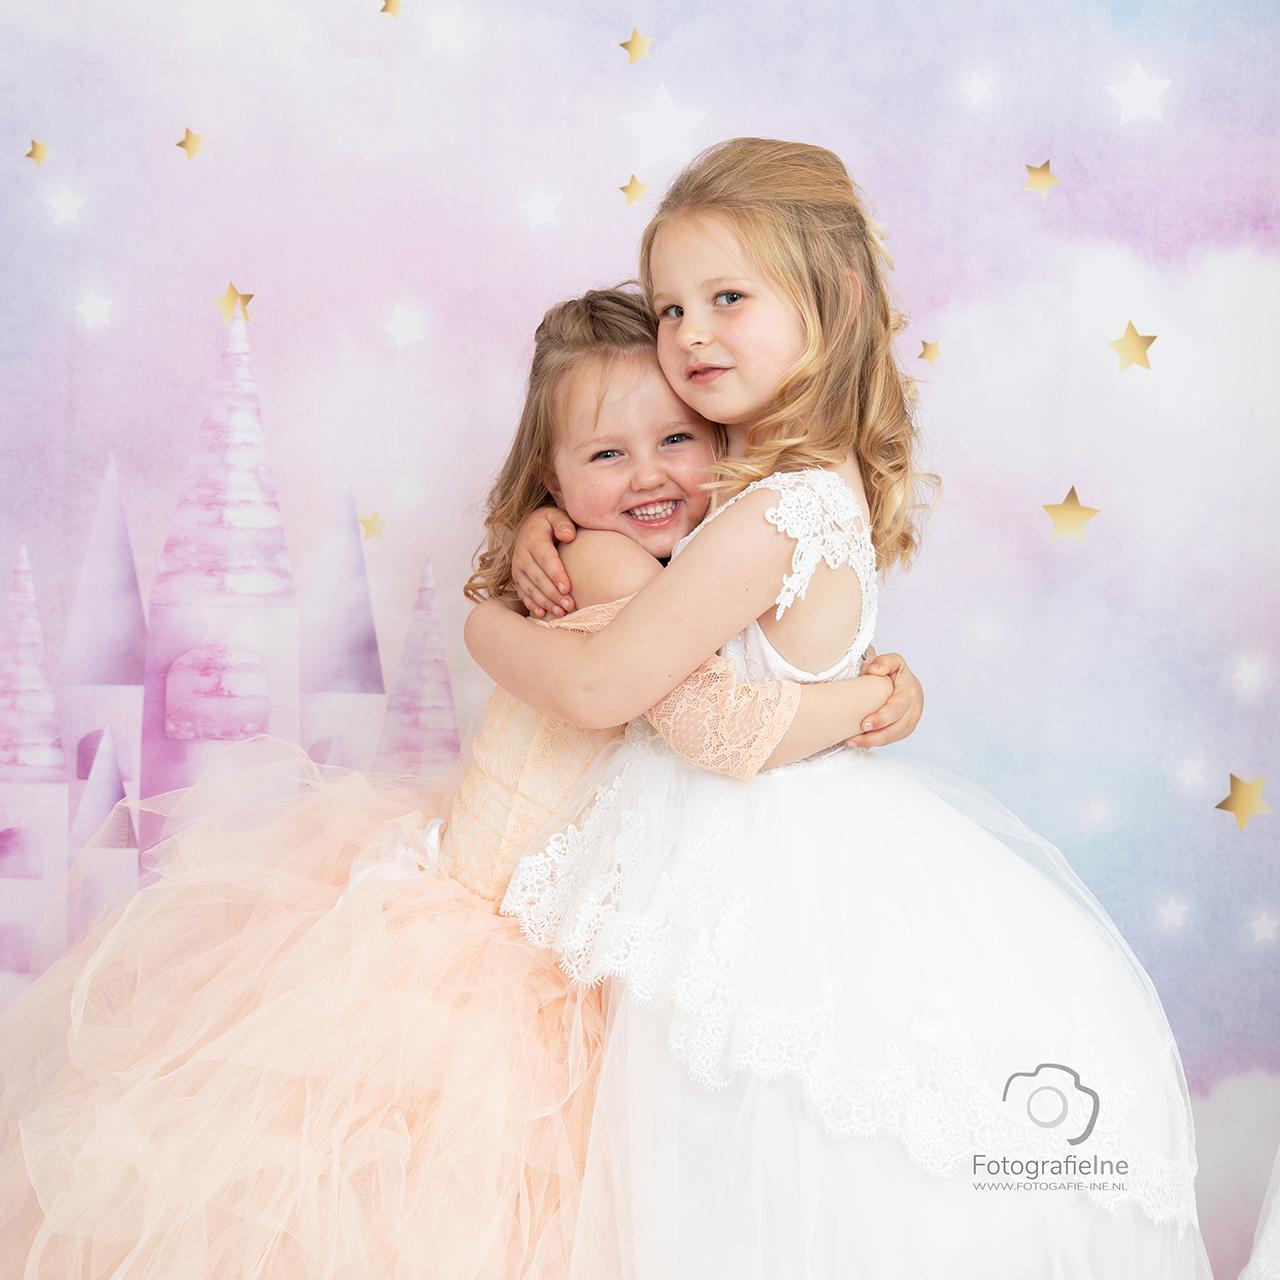 Fotografie Ine Prinsessen fotoshoot zusjes